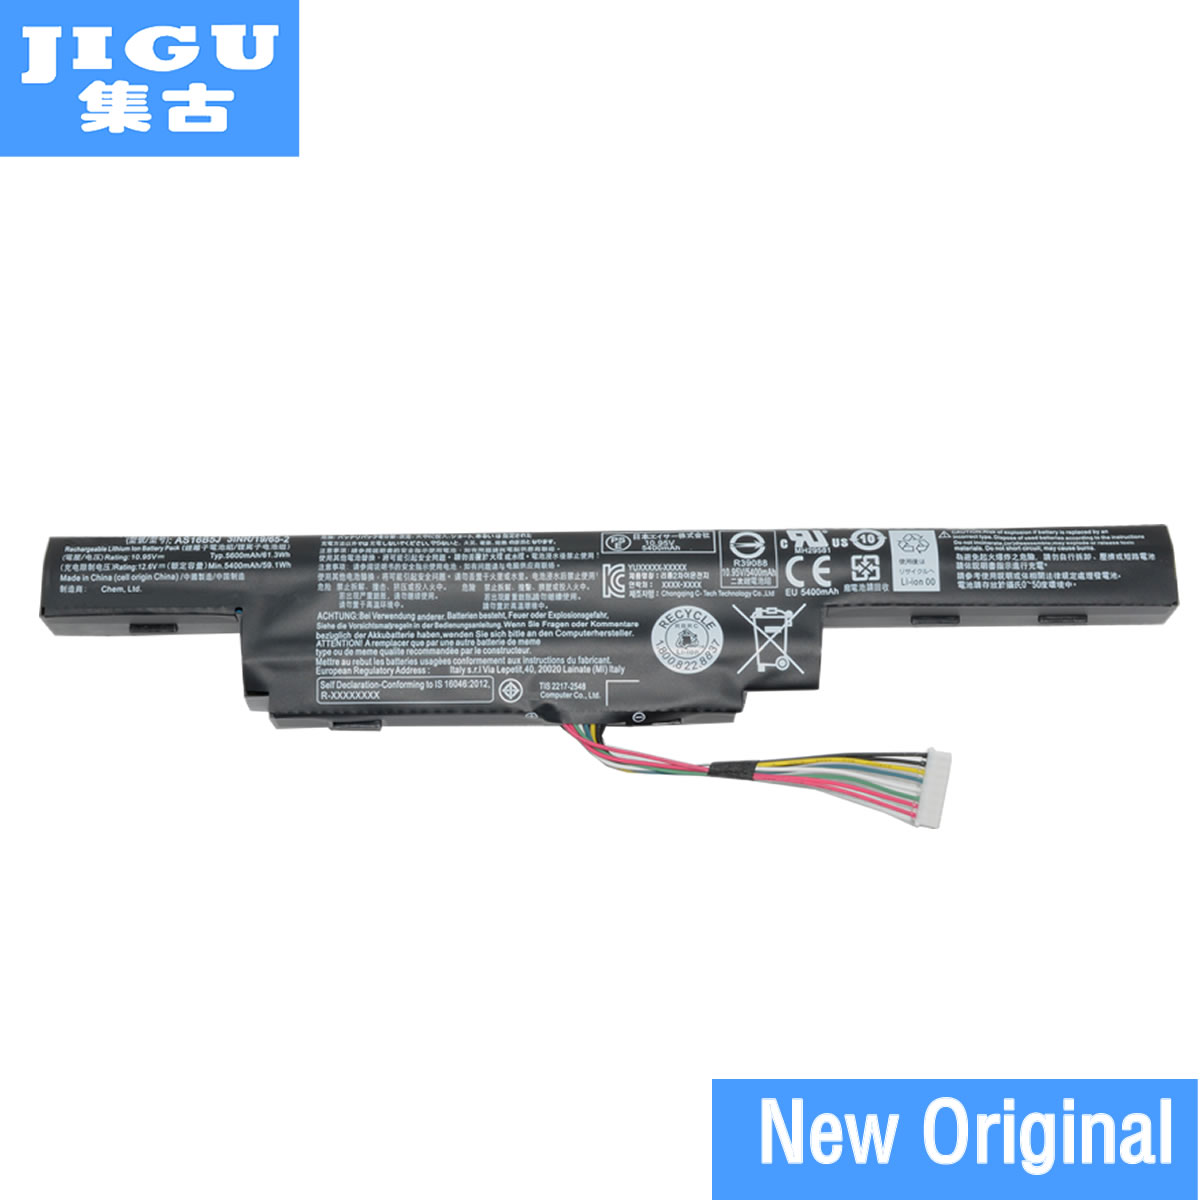 JIGU AS16B5J AS16B8J Original Laptop Battery For ACER For Aspire E5-575G 10.95V 61.3WH